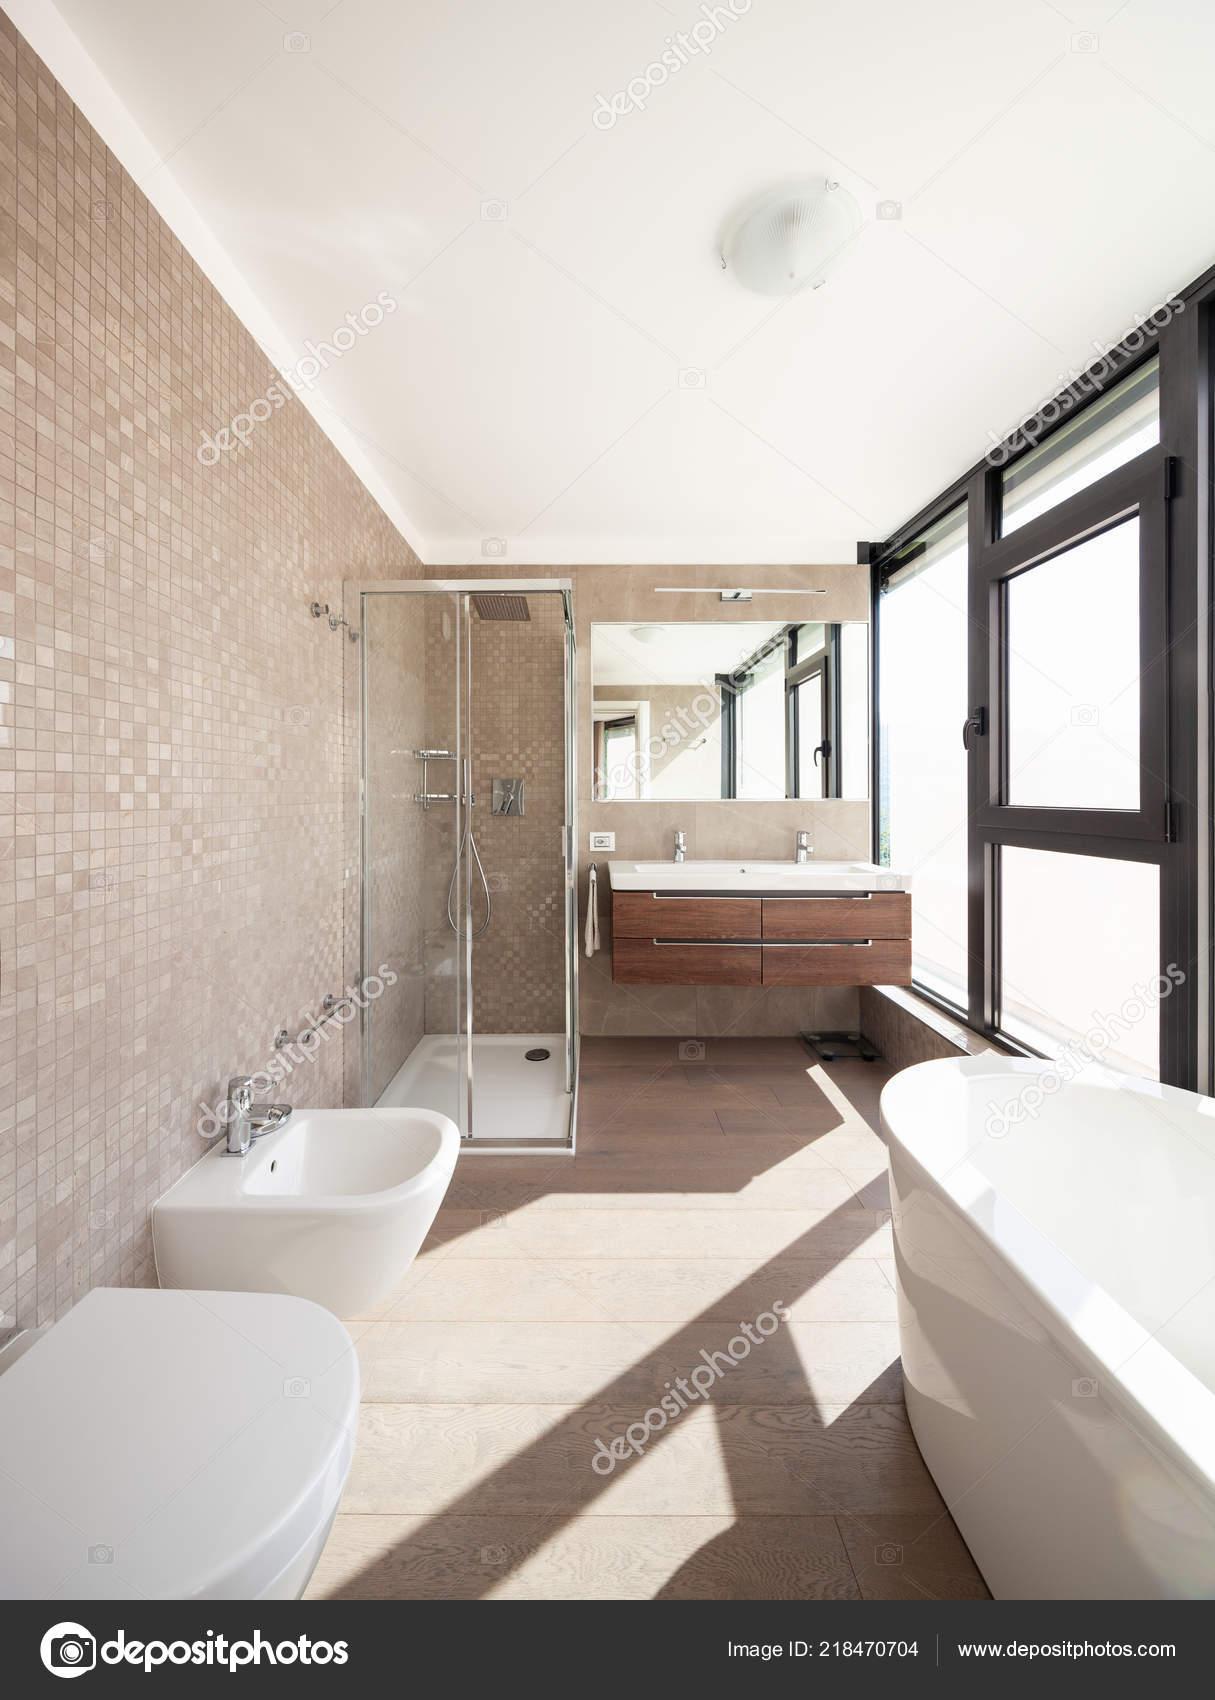 . Modern Wooden Bathroom Large Windows Nobody   Stock Photo   Zveiger